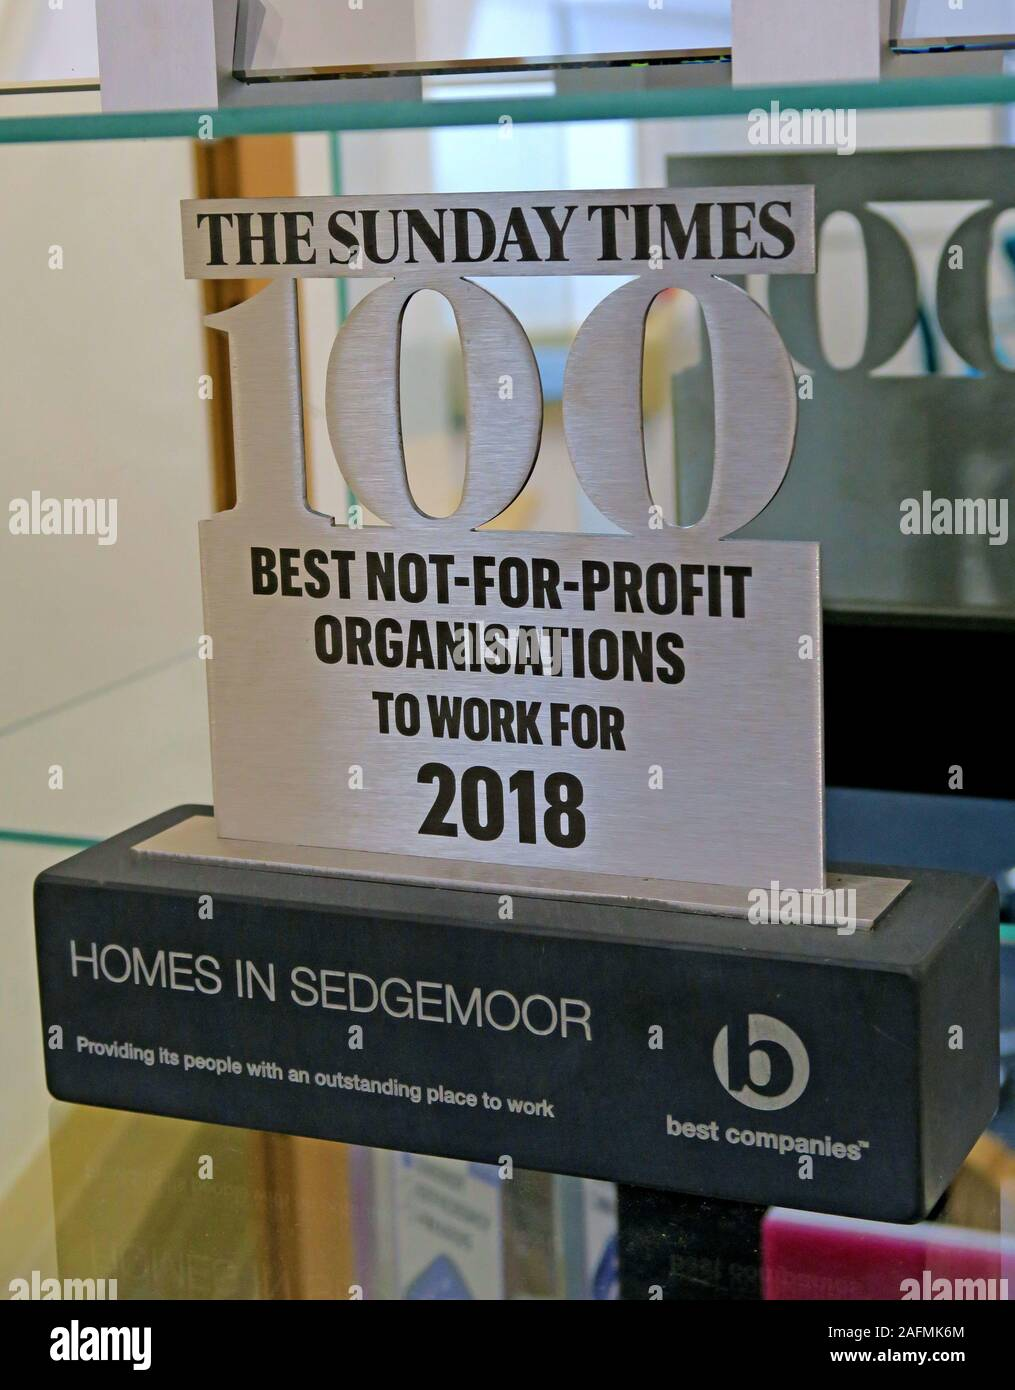 HotpixUK,@HotpixUK,GoTonySmith,Bridgwater,Somerset,SDC,Sedgemoor,Sedgemoor District Council,South West England,England,UK,South West,town,TA6,100 Best,cabinet,HiS,trophy,trophy chest,2018